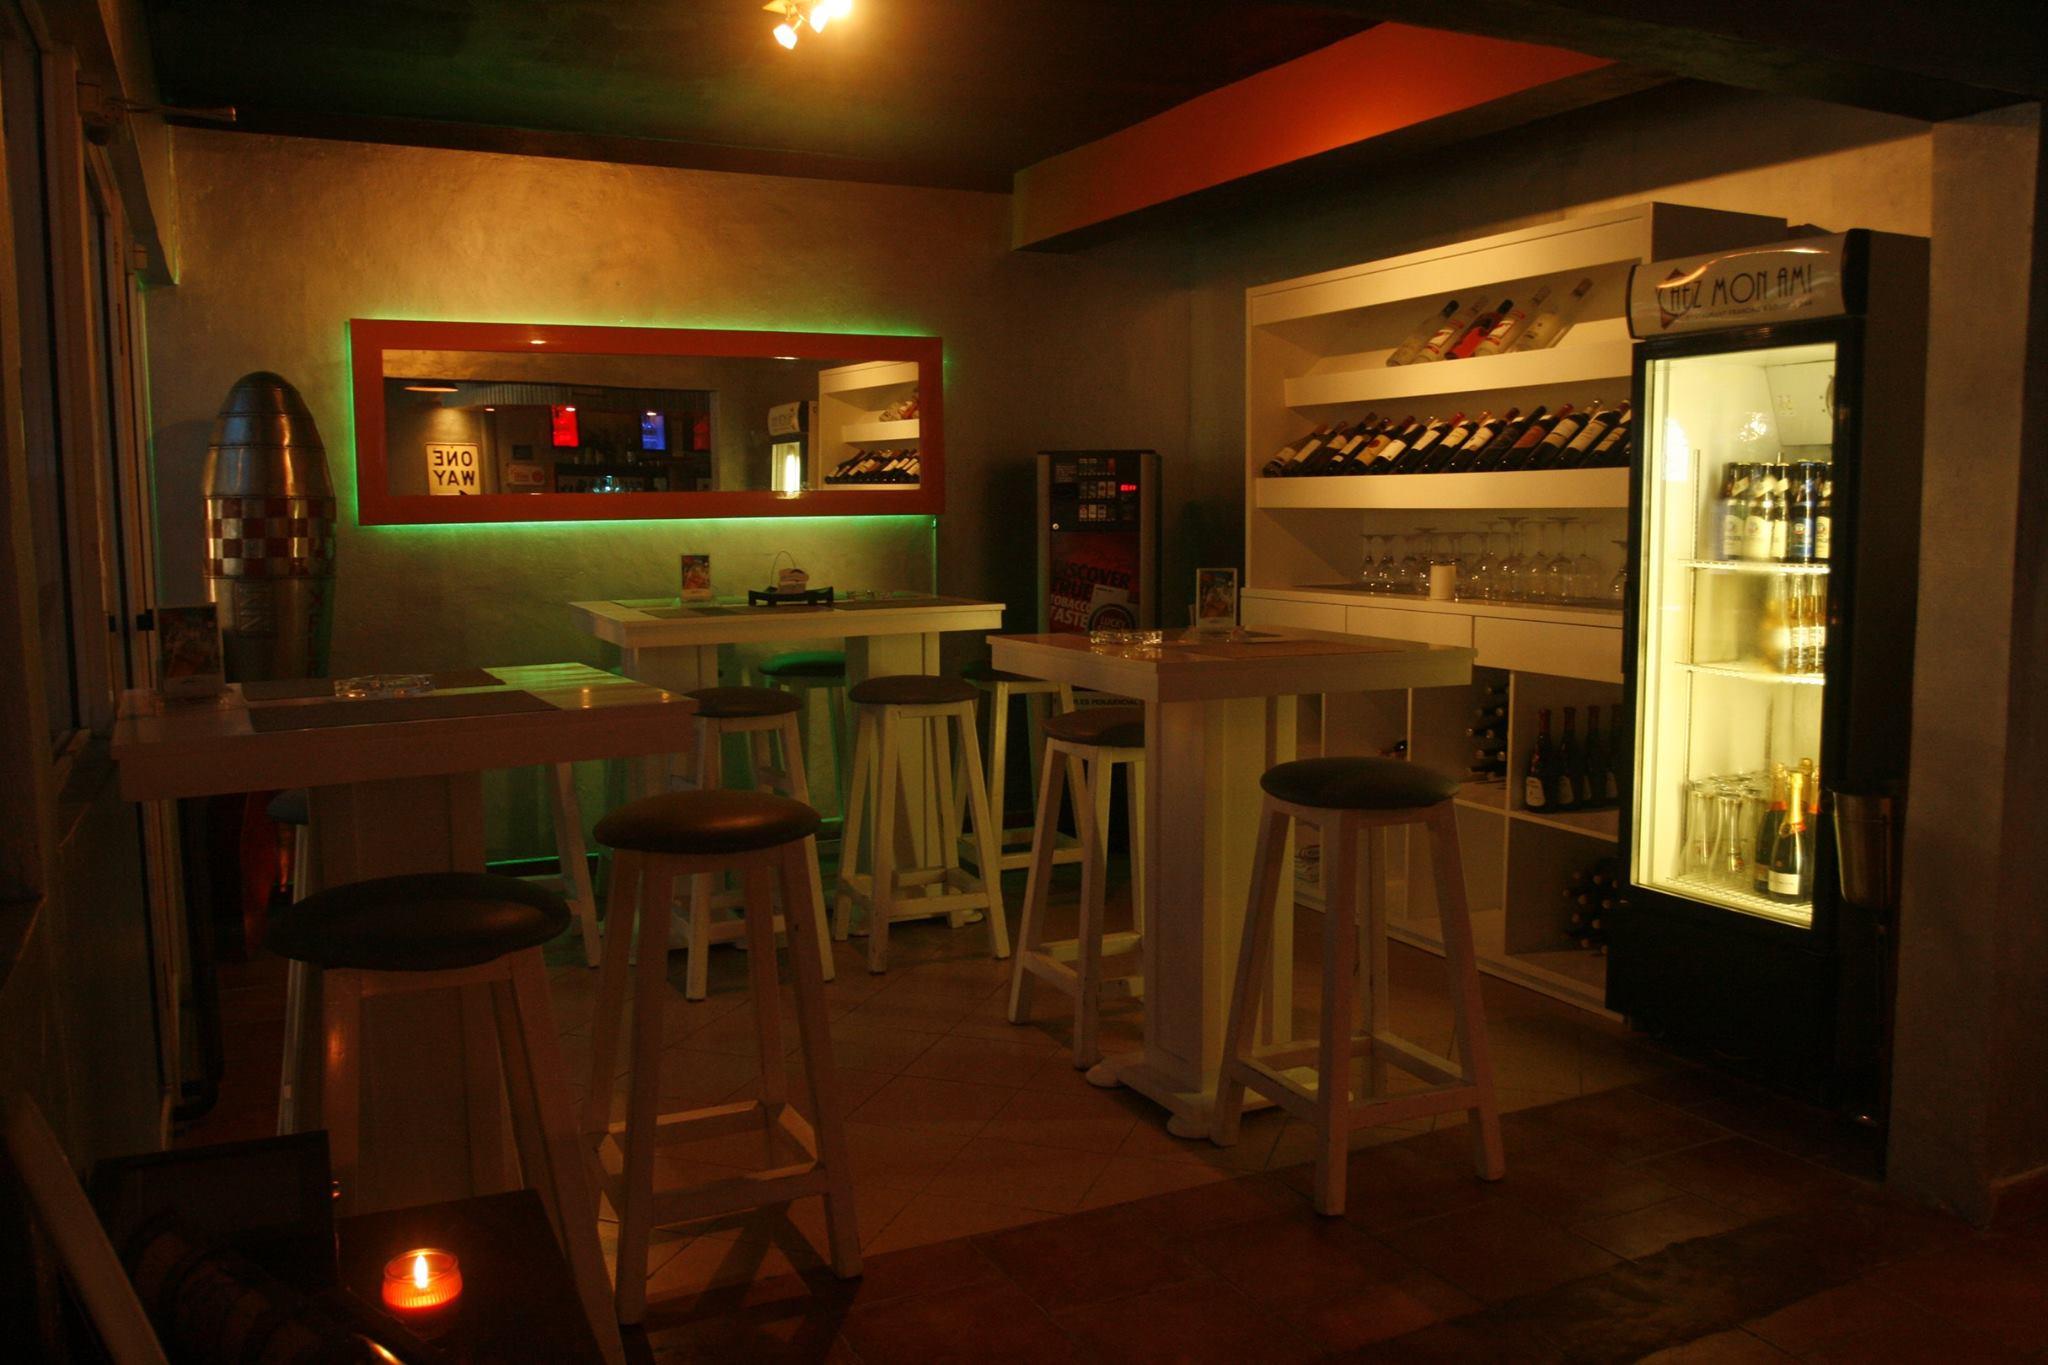 restaurants in punta cana, best restaurants in punta cana, punta cana food, where to eat in punta cana, chez mon ami